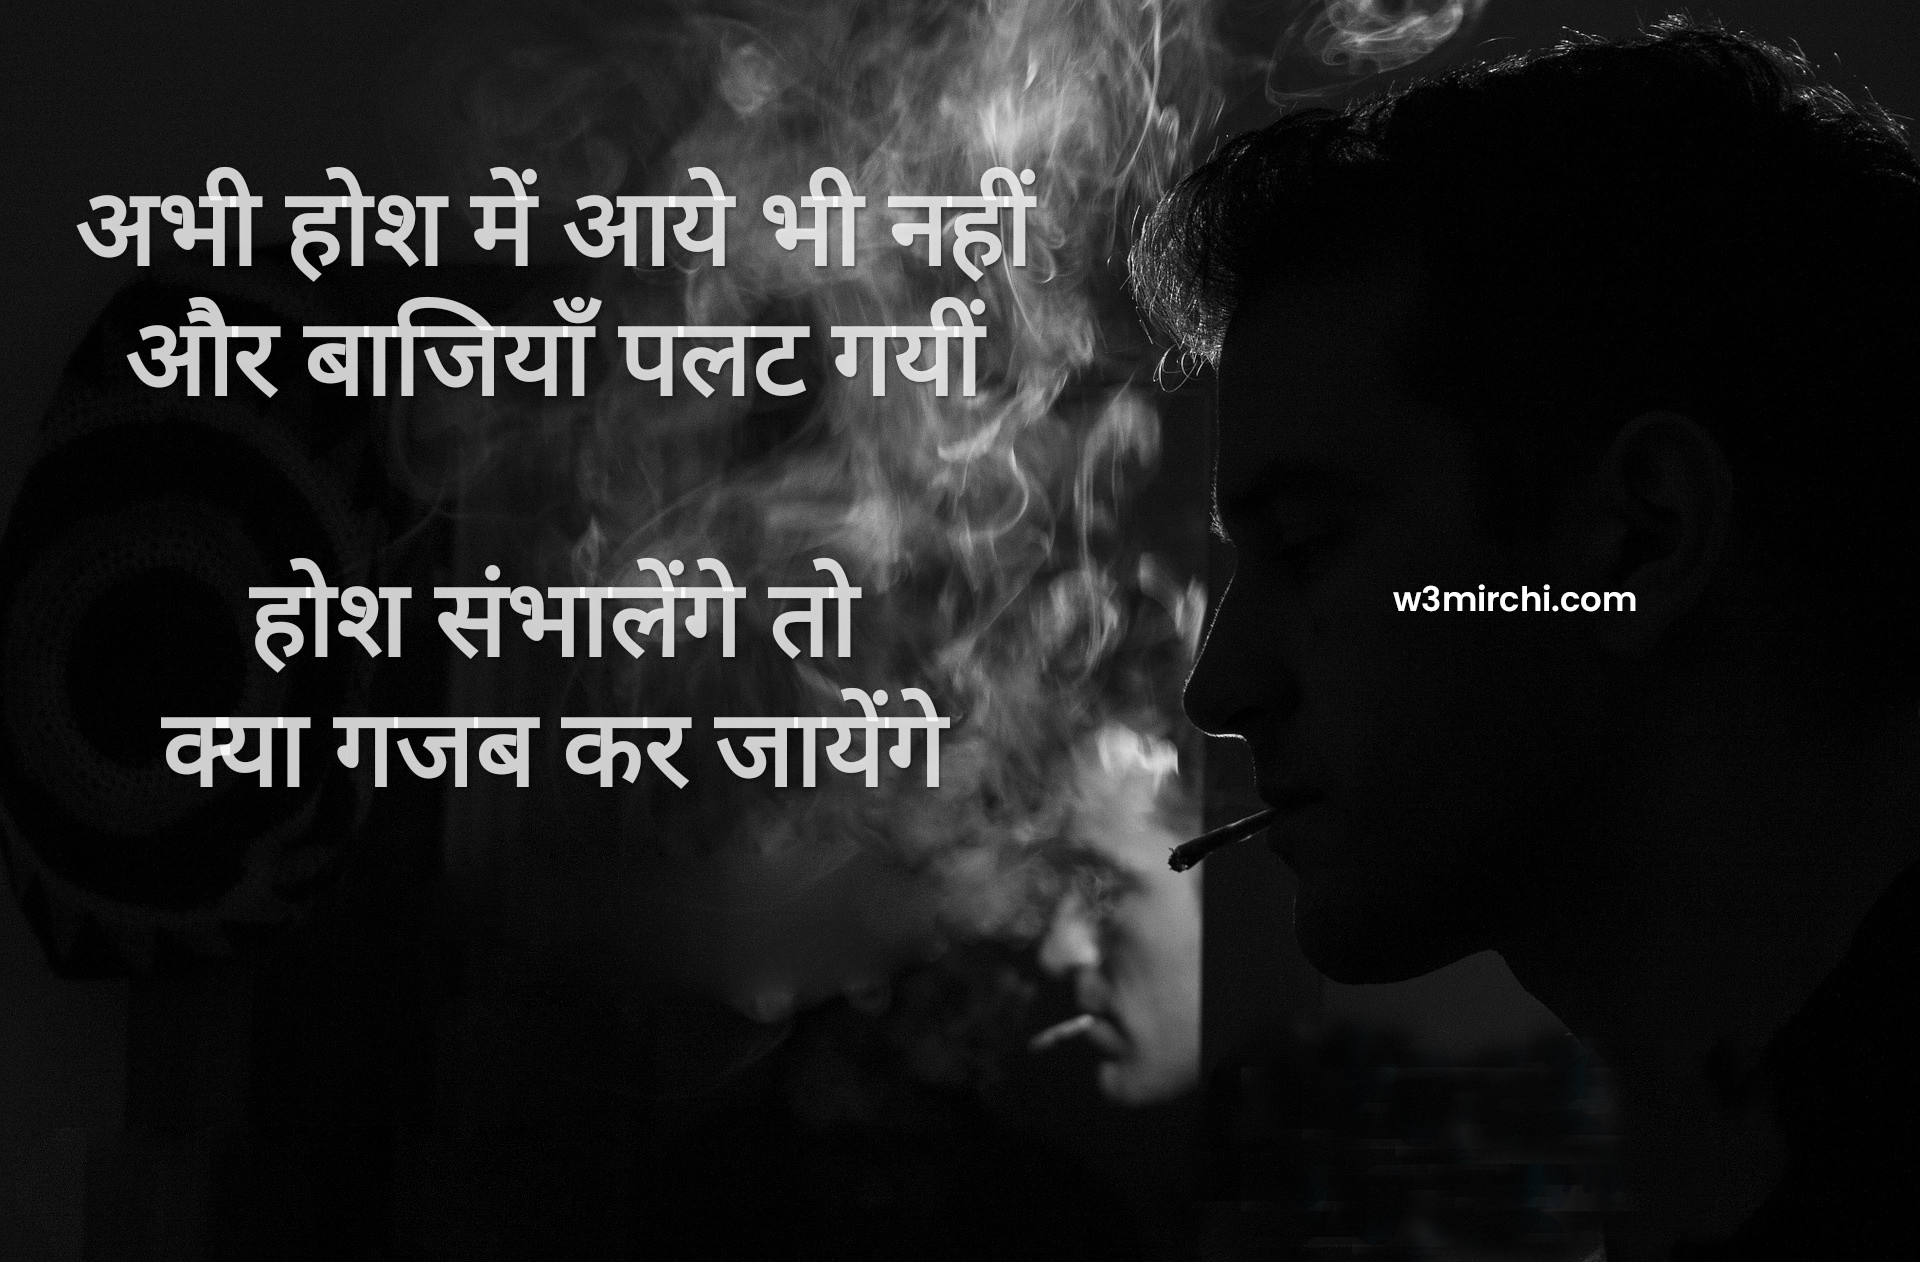 Hosh Shayari